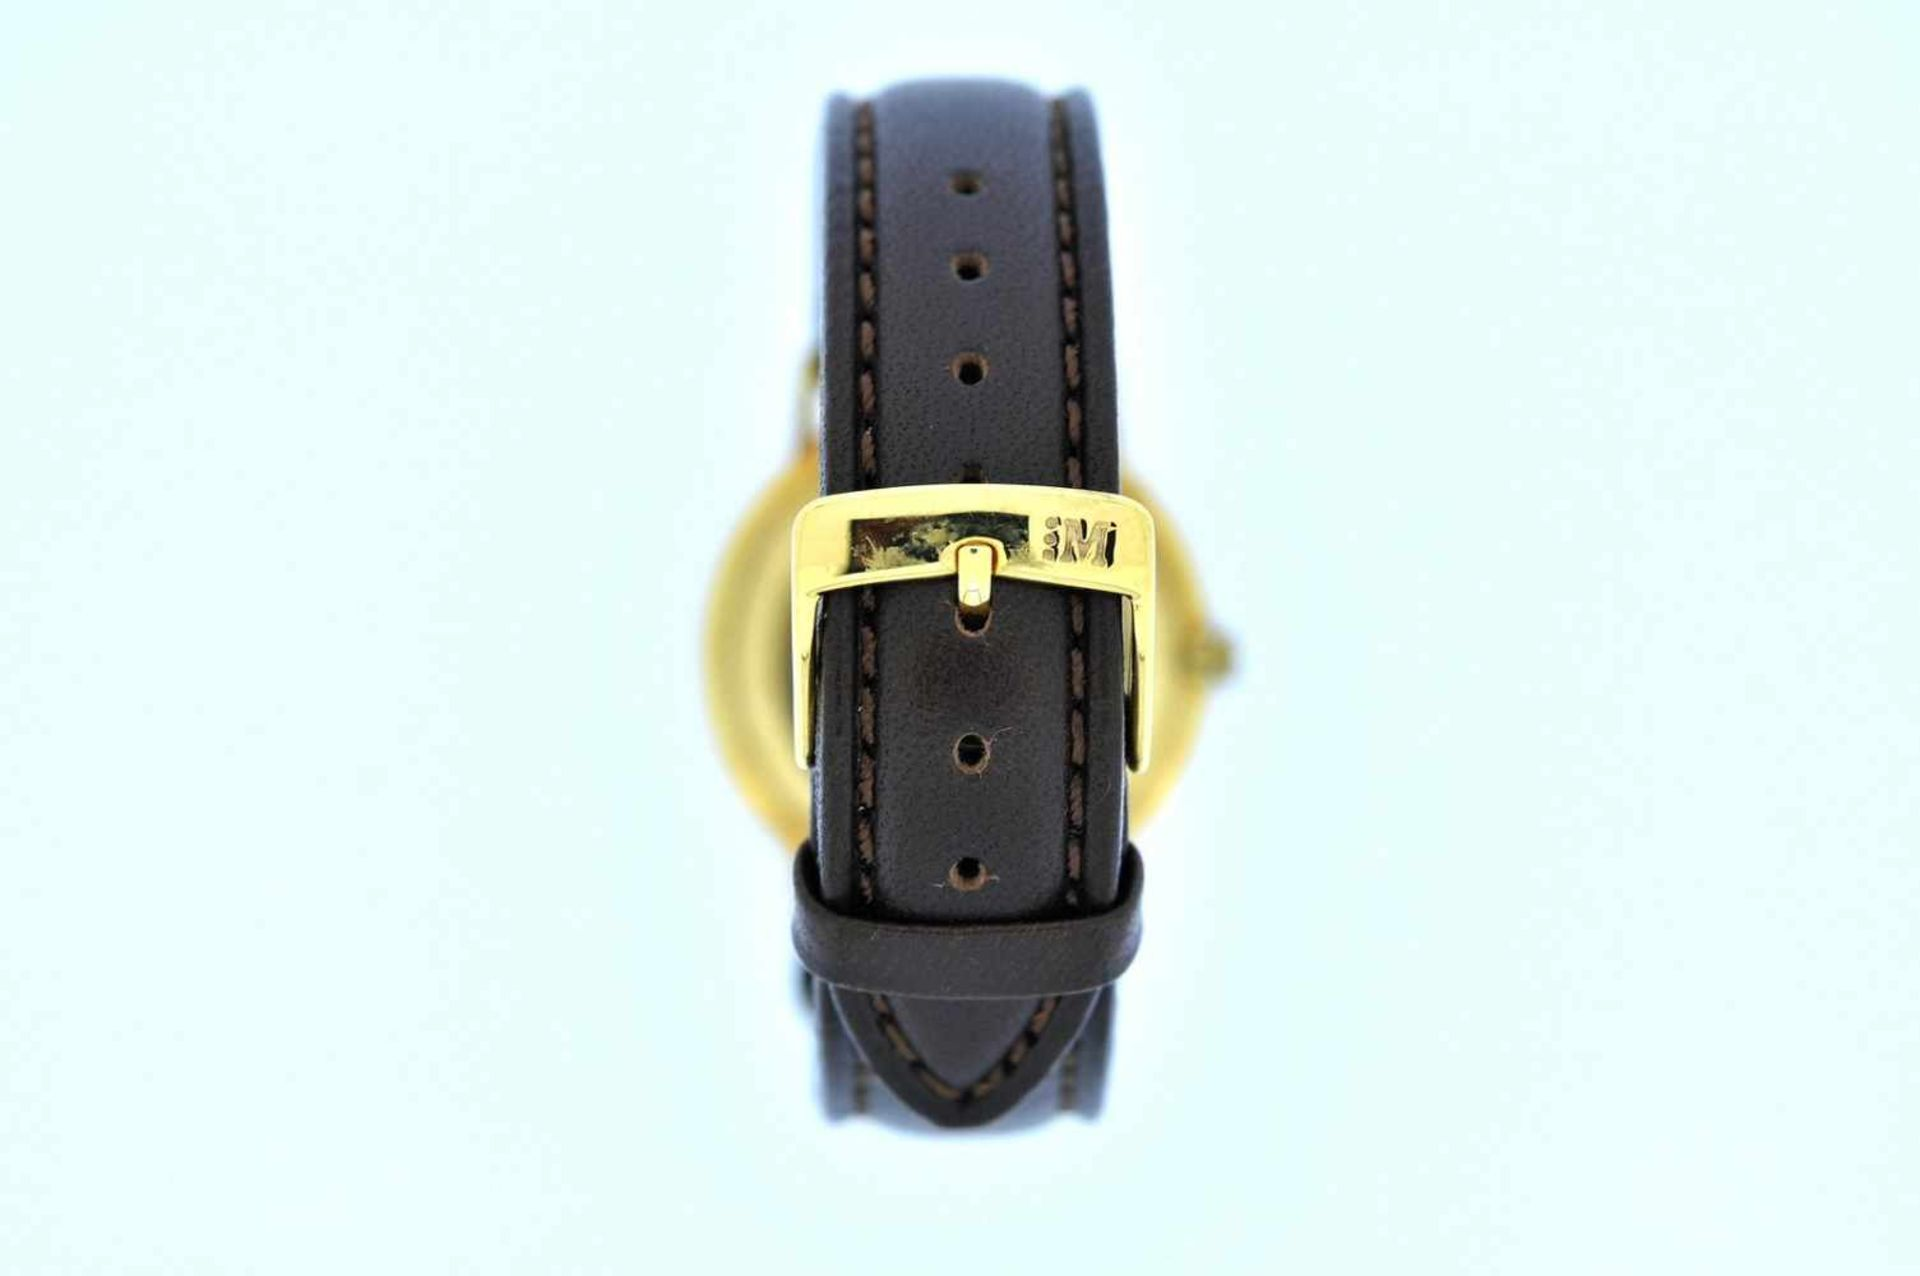 Eska Goldene Armbanduhr an Lederband, Eska, Handaufzug, Ankerwerk, Werkservice empfohlen, 28,1 g. - Bild 4 aus 6